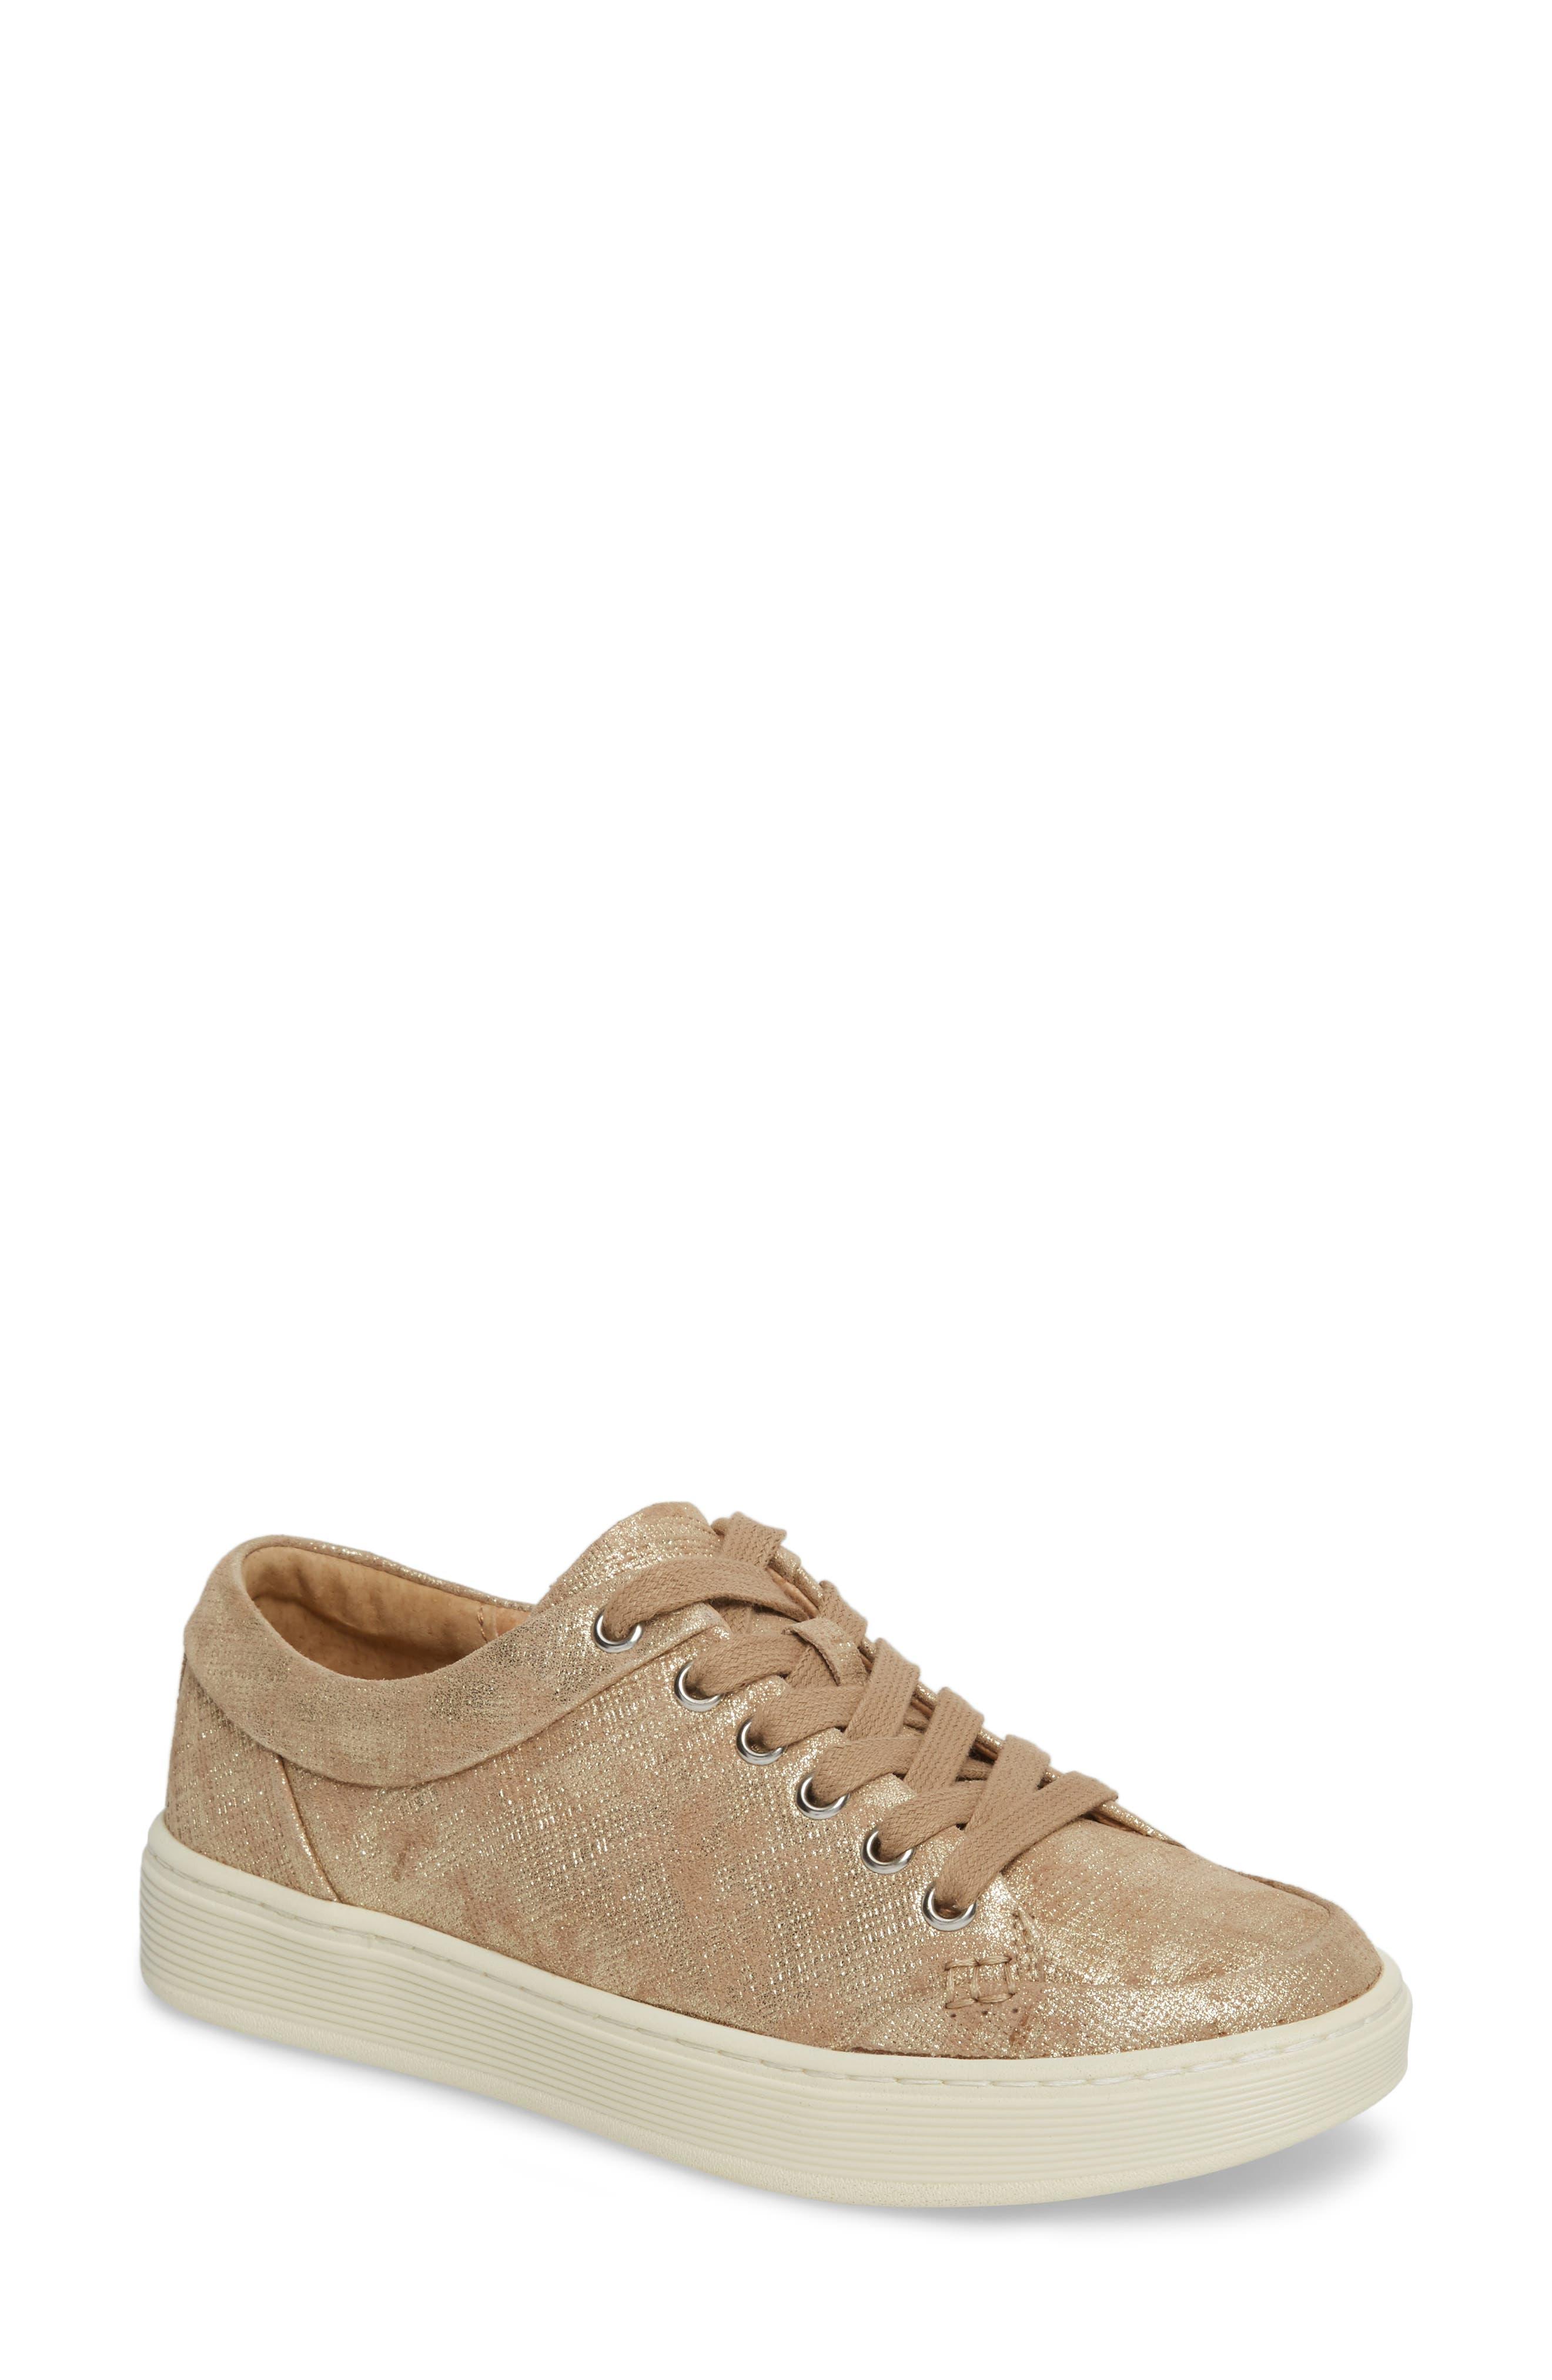 Sanders Sneaker,                         Main,                         color, Platino Distressed Suede